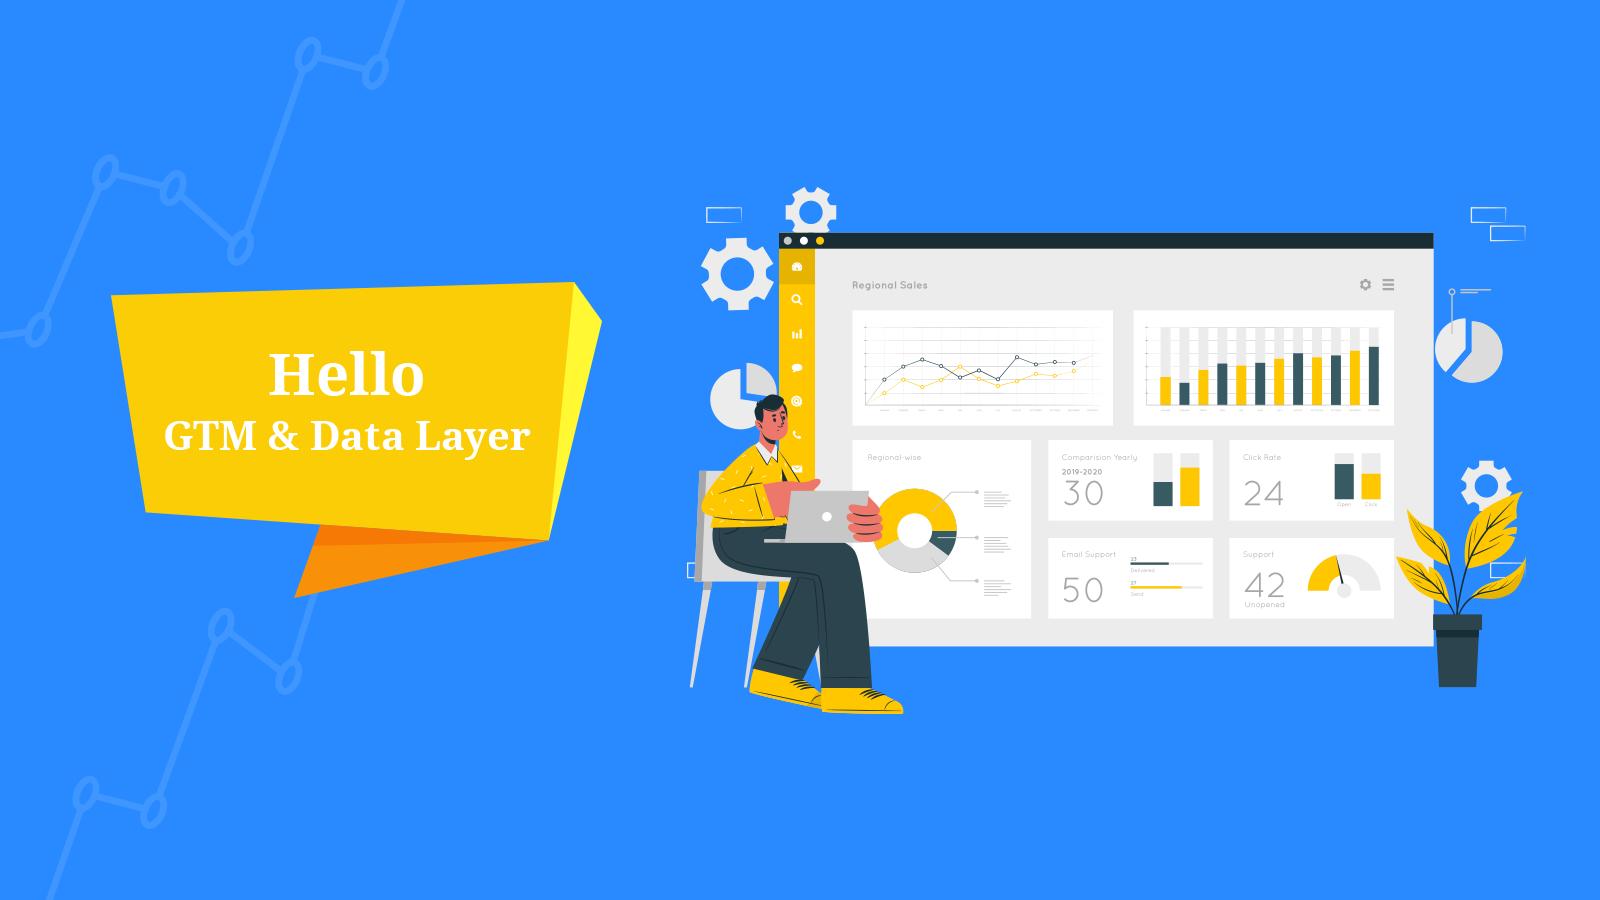 Hello GTM & Data Layer